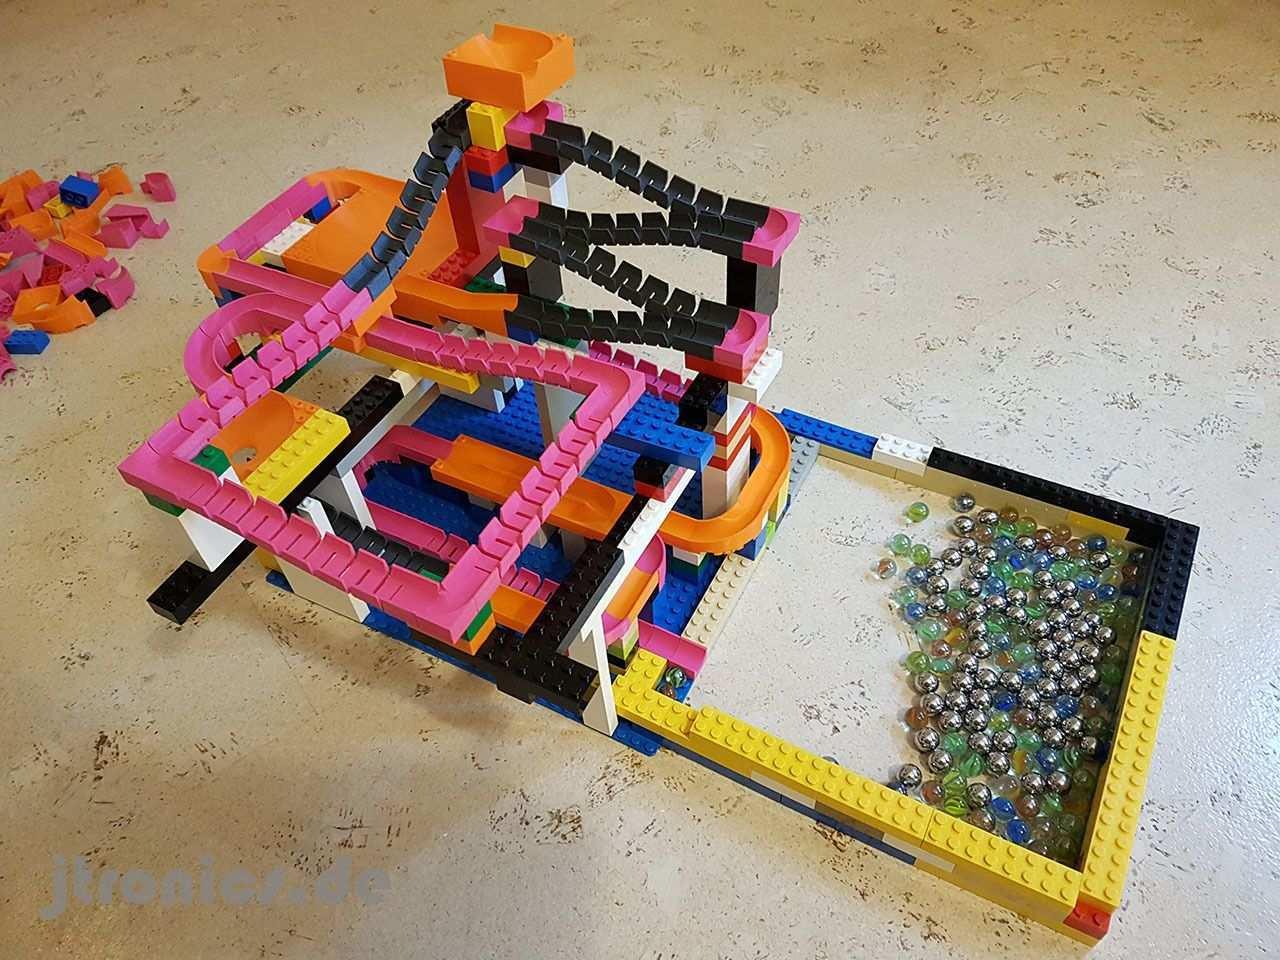 Marble Run Building Brick Set Basic Pinshape Marble Run Lego Projects Building Blocks